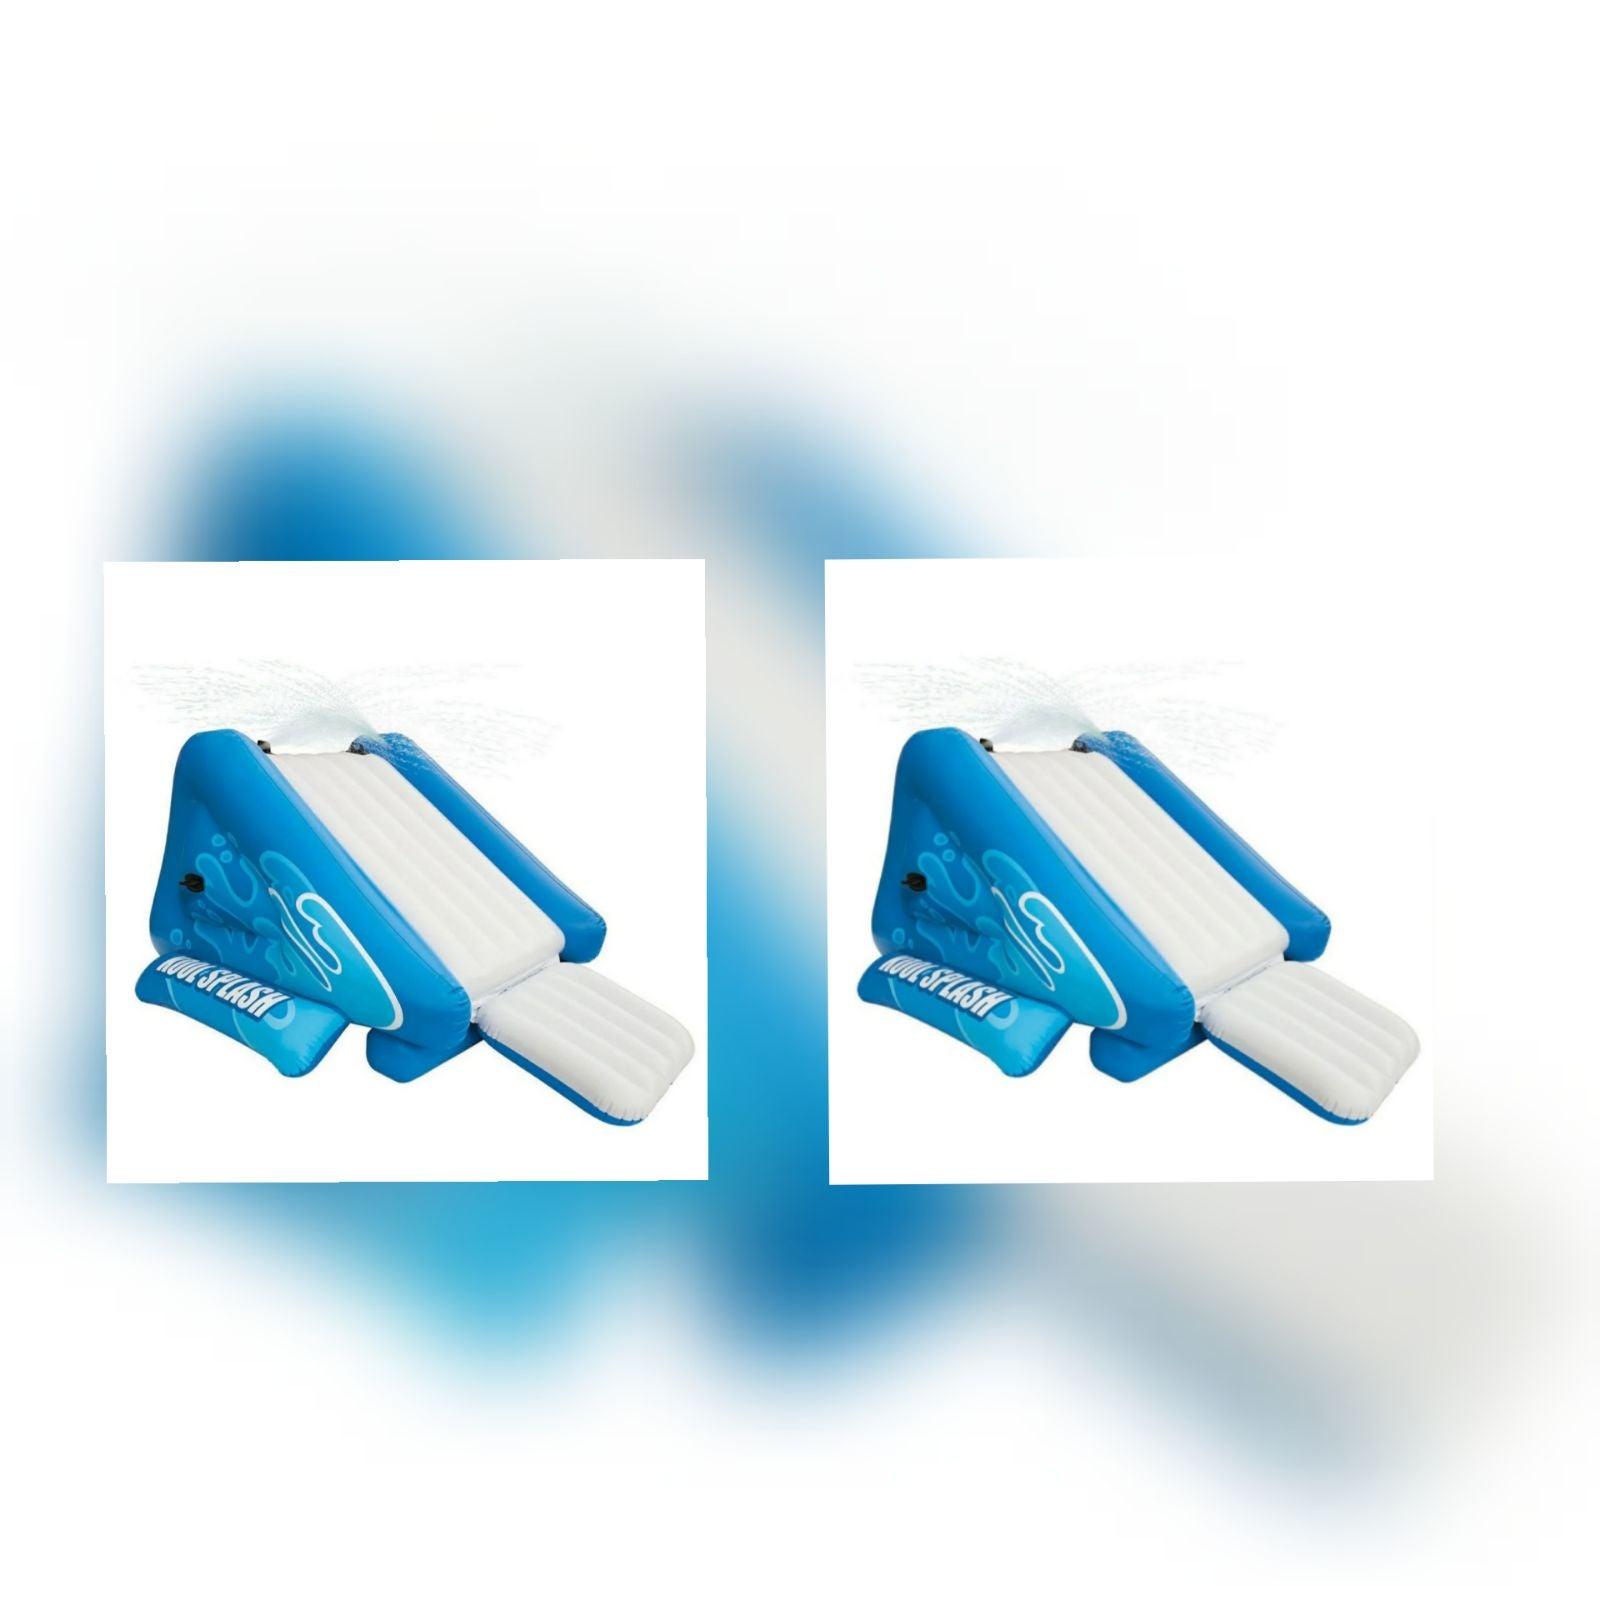 2 Intex Kool Splash Water Slides ..ak